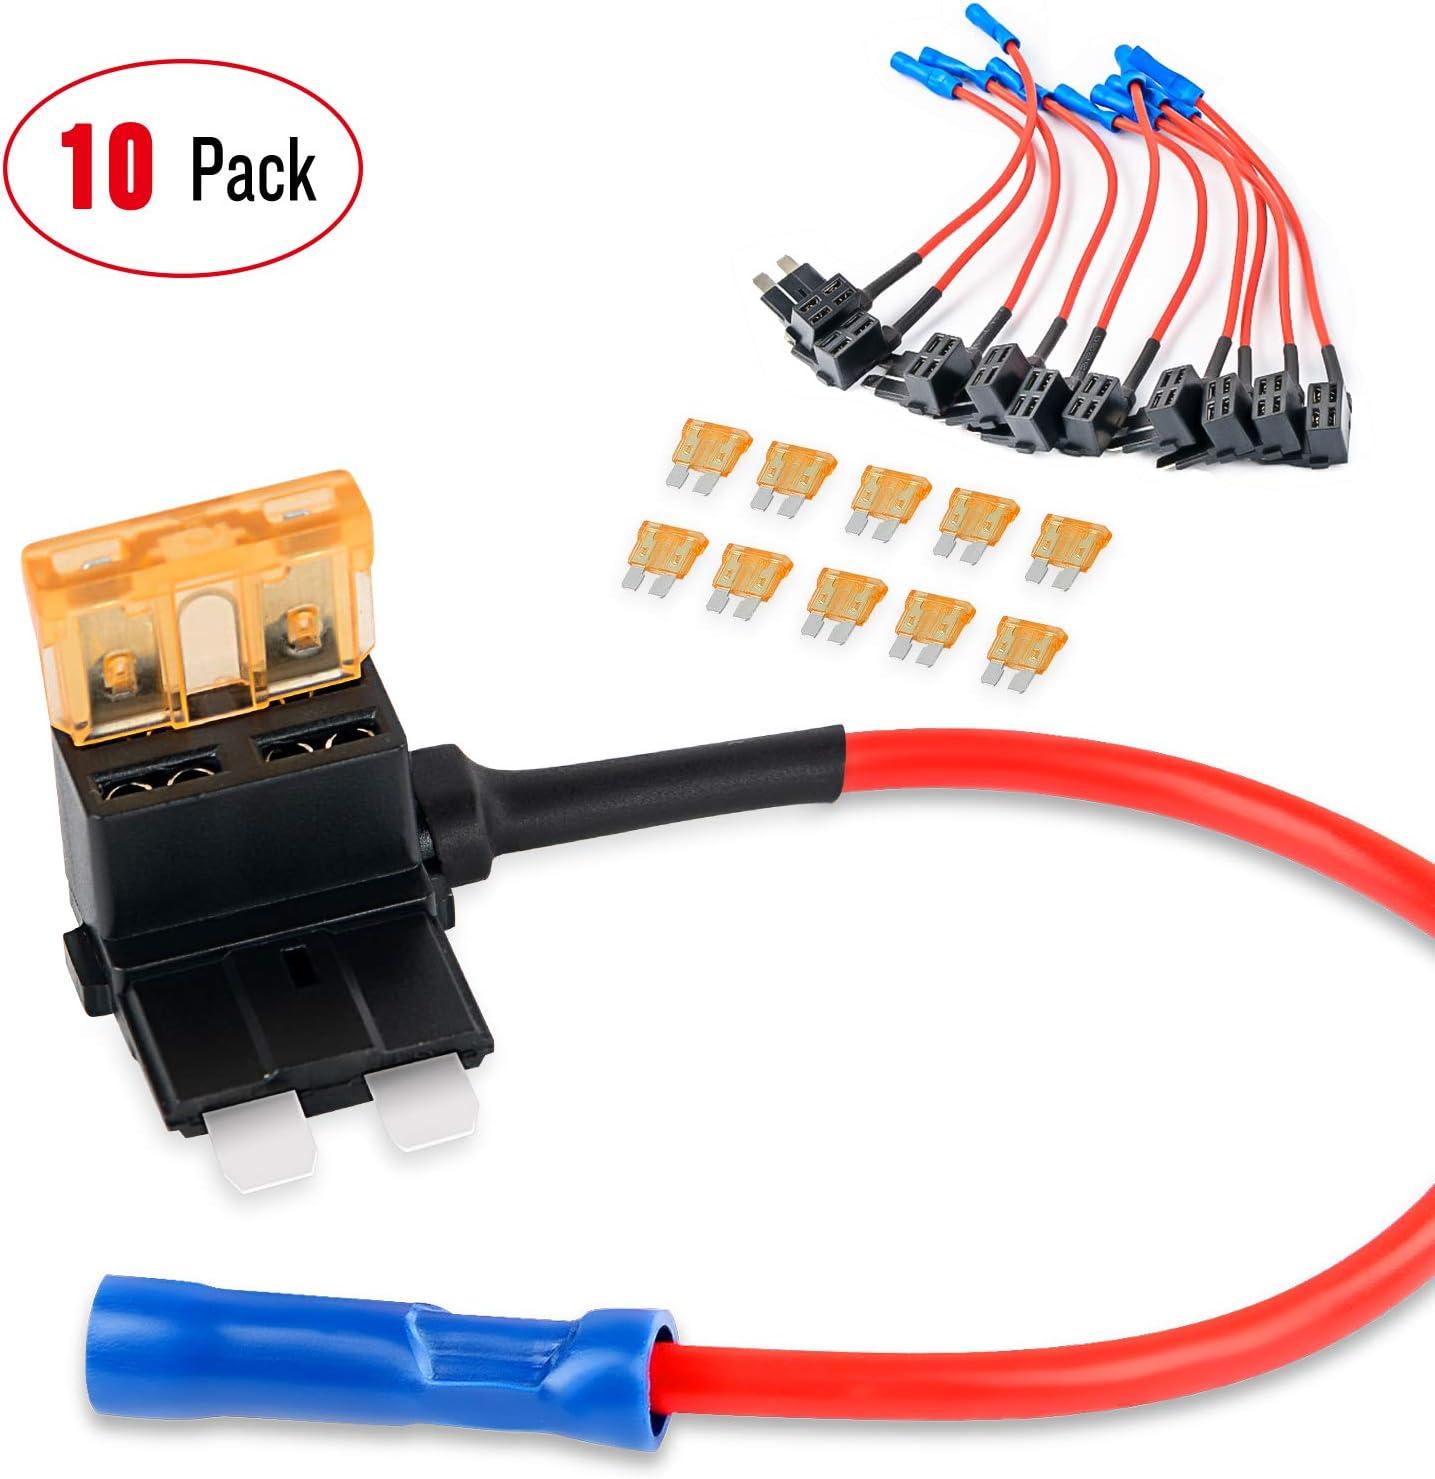 fuse box adapter amazon com nilight 50039r 10pack holder 10 pack 12v add a circuit  nilight 50039r 10pack holder